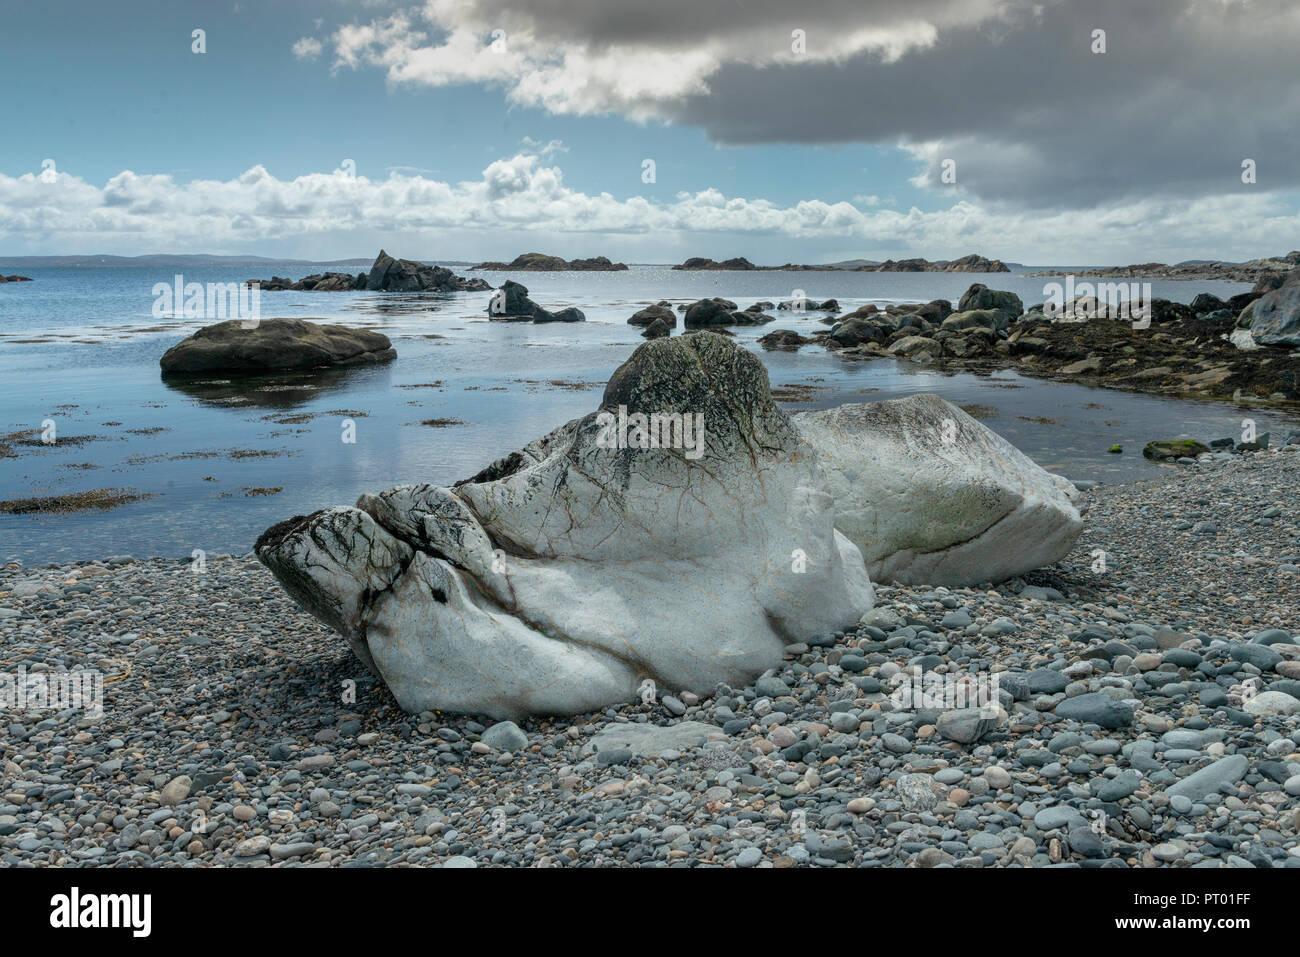 Ireland, Inish Boffin Island, Co Galway, Strange Rock formation on beach. - Stock Image